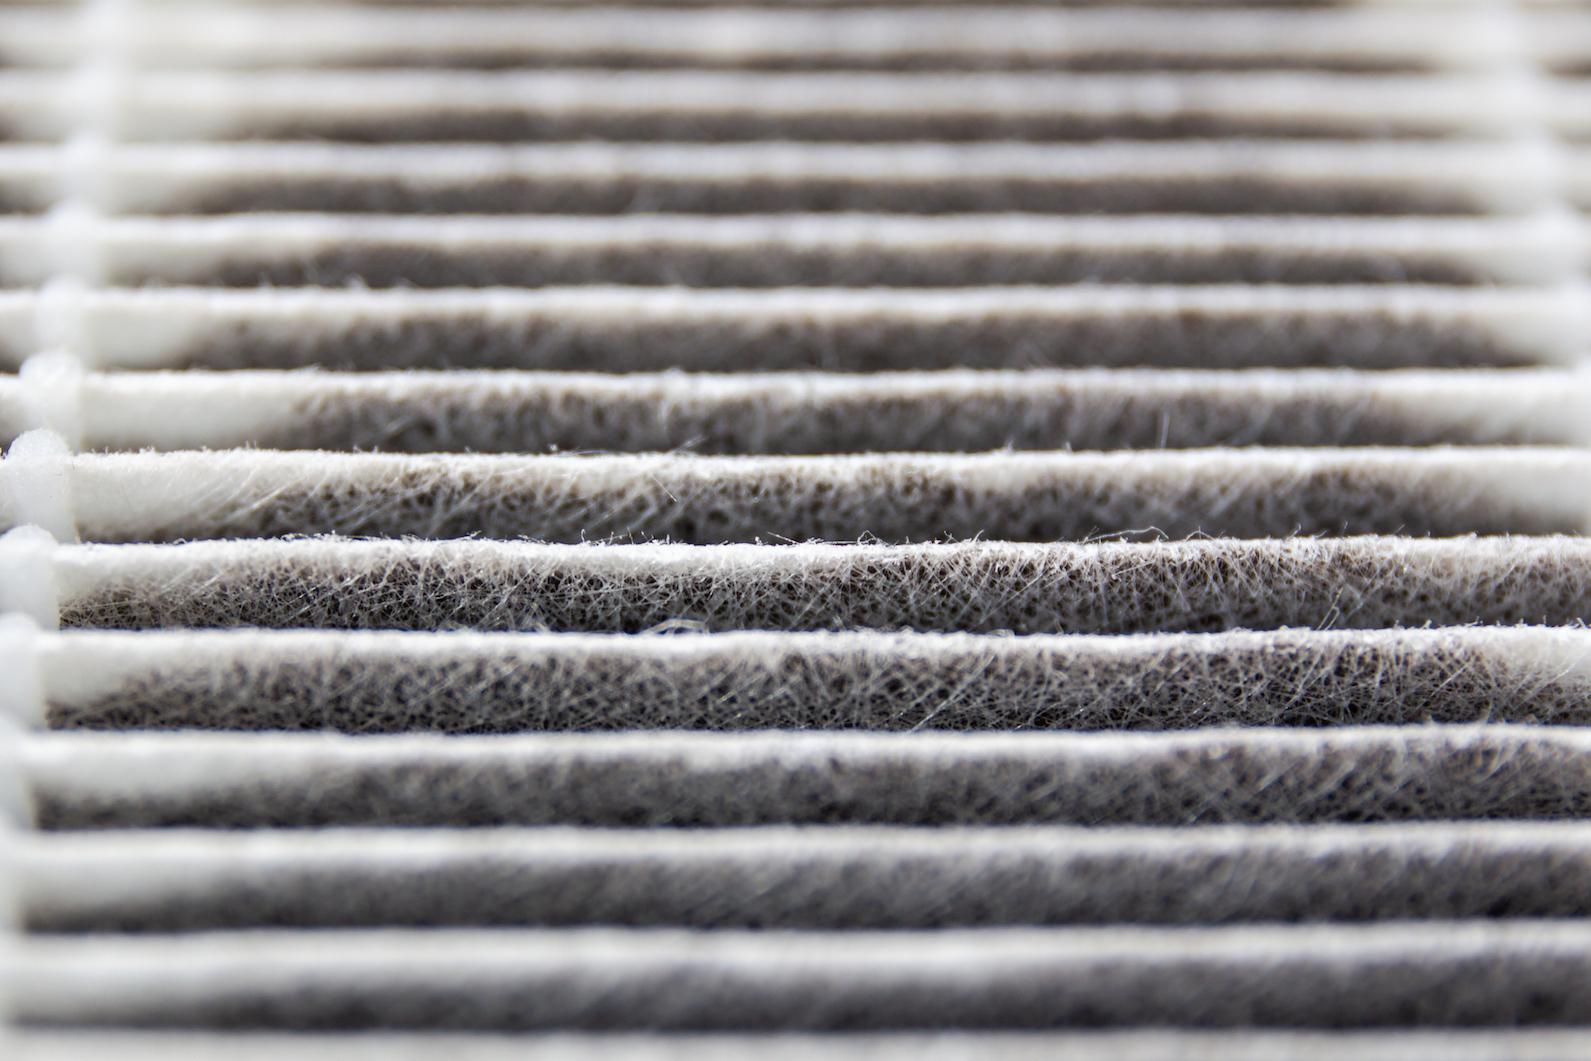 dusty-mechanical-air-filter